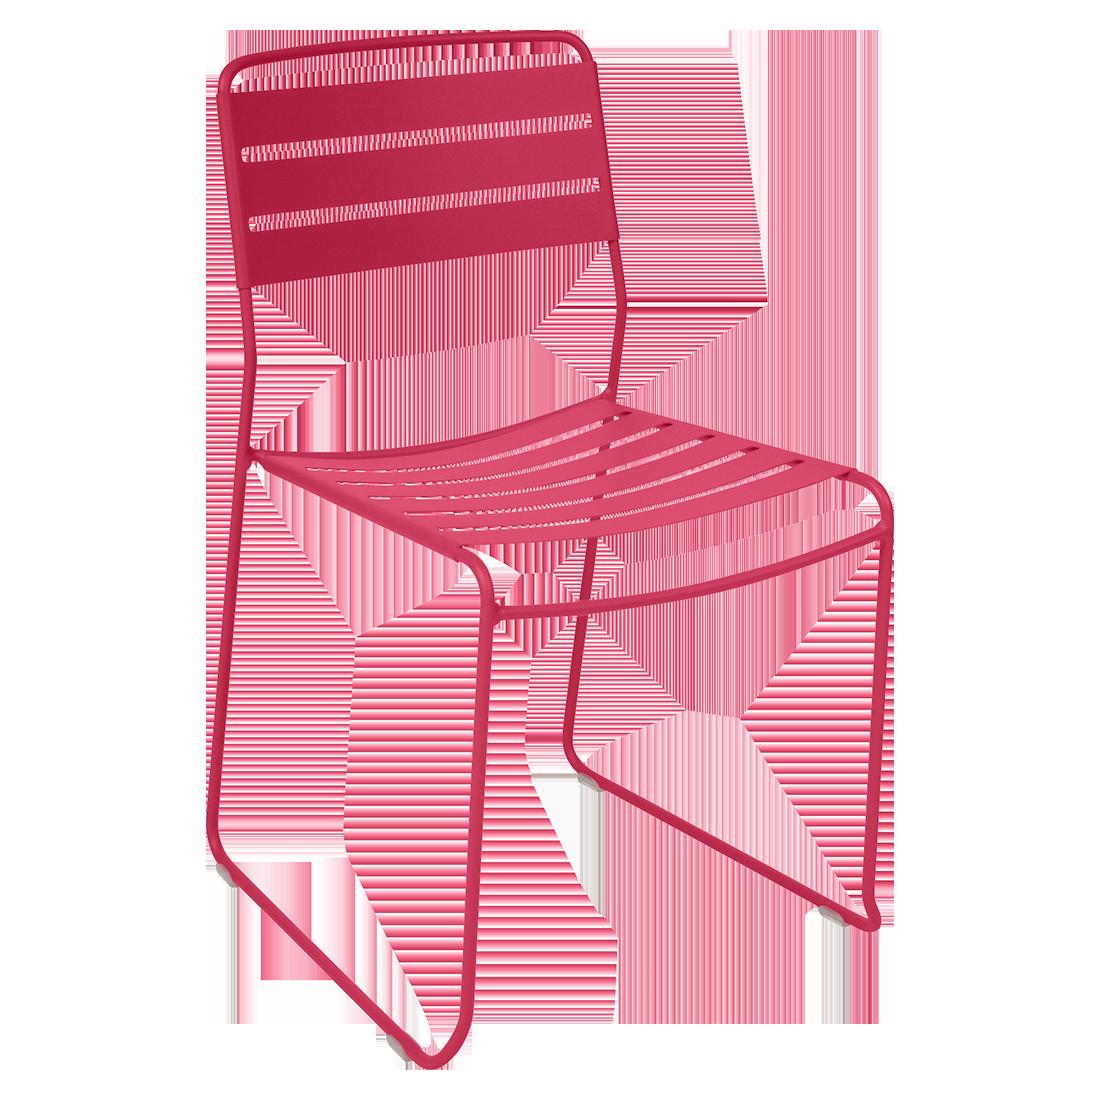 chaise metal, chaise de jardin, chaise metal design, chaise rose